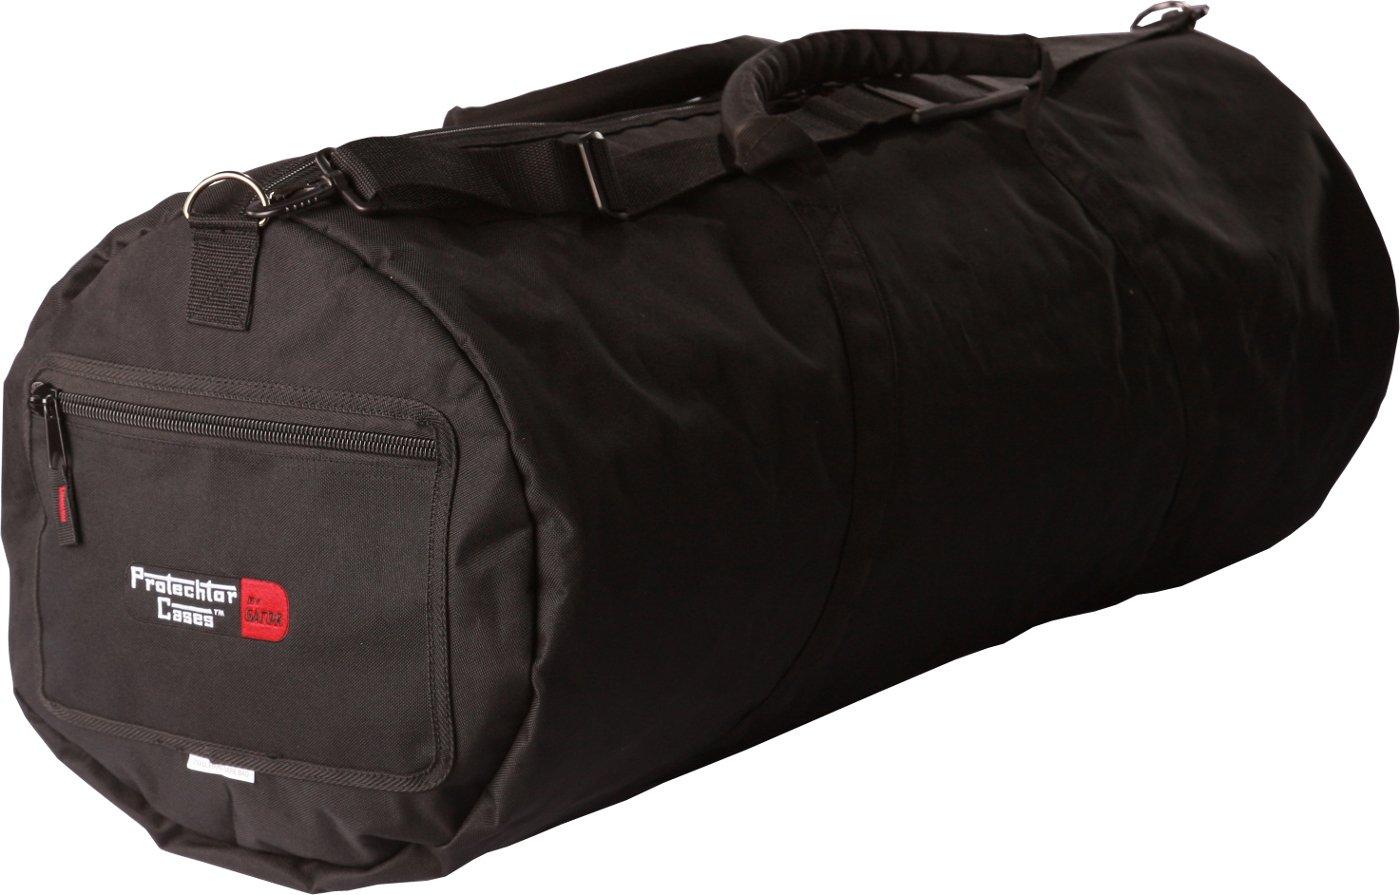 "14"" x 36"" Drum Hardware Bag"